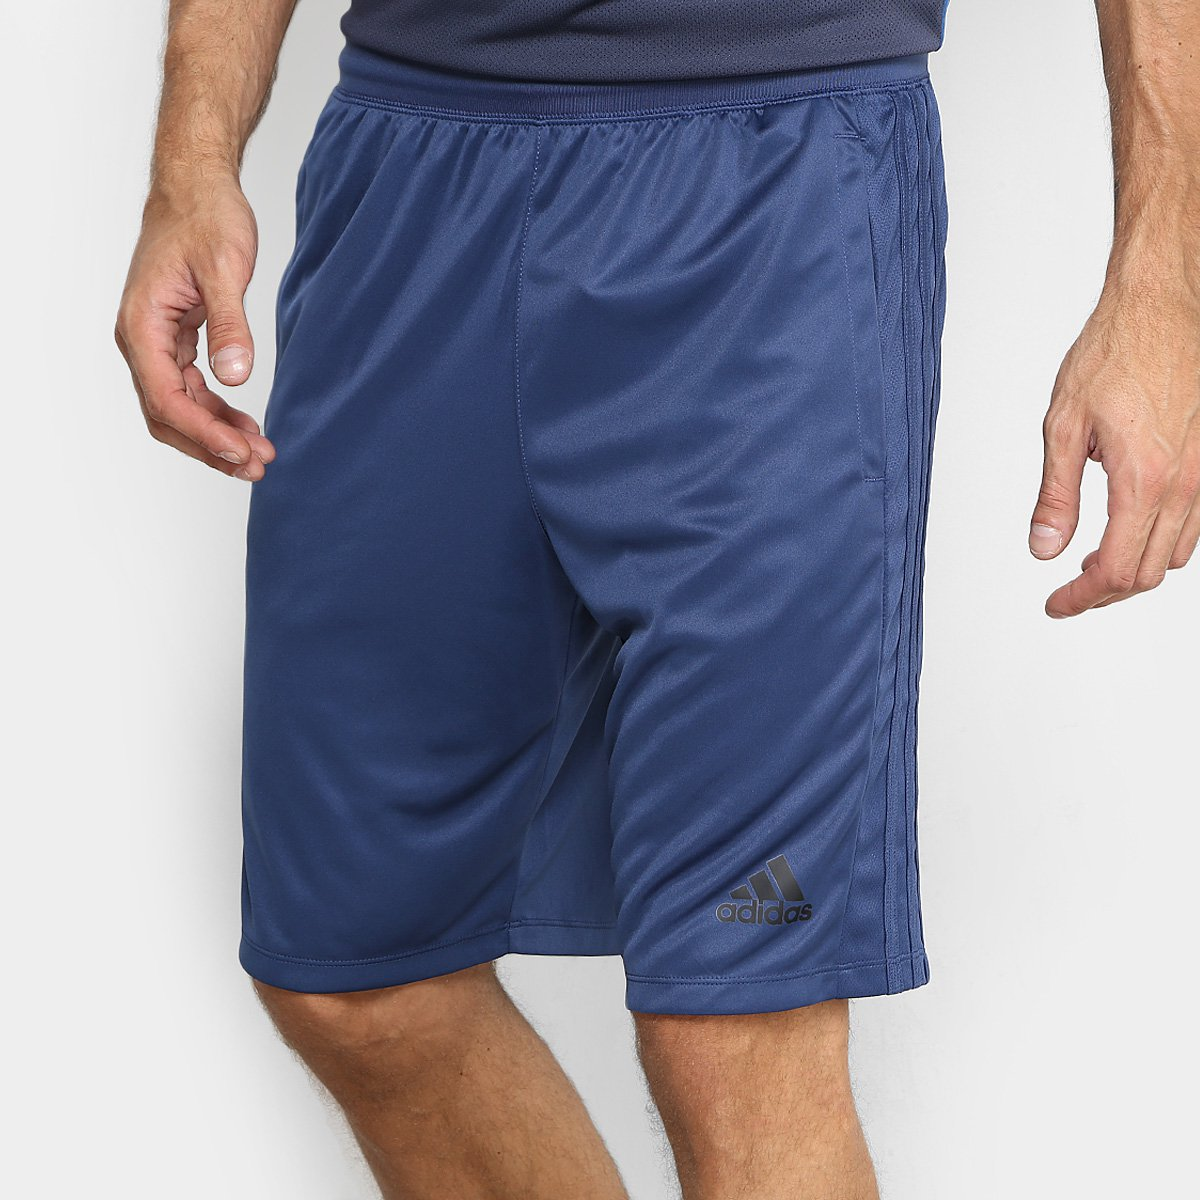 82c9955b40 Bermuda Adidas D2M 3S Masculina - Compre Agora